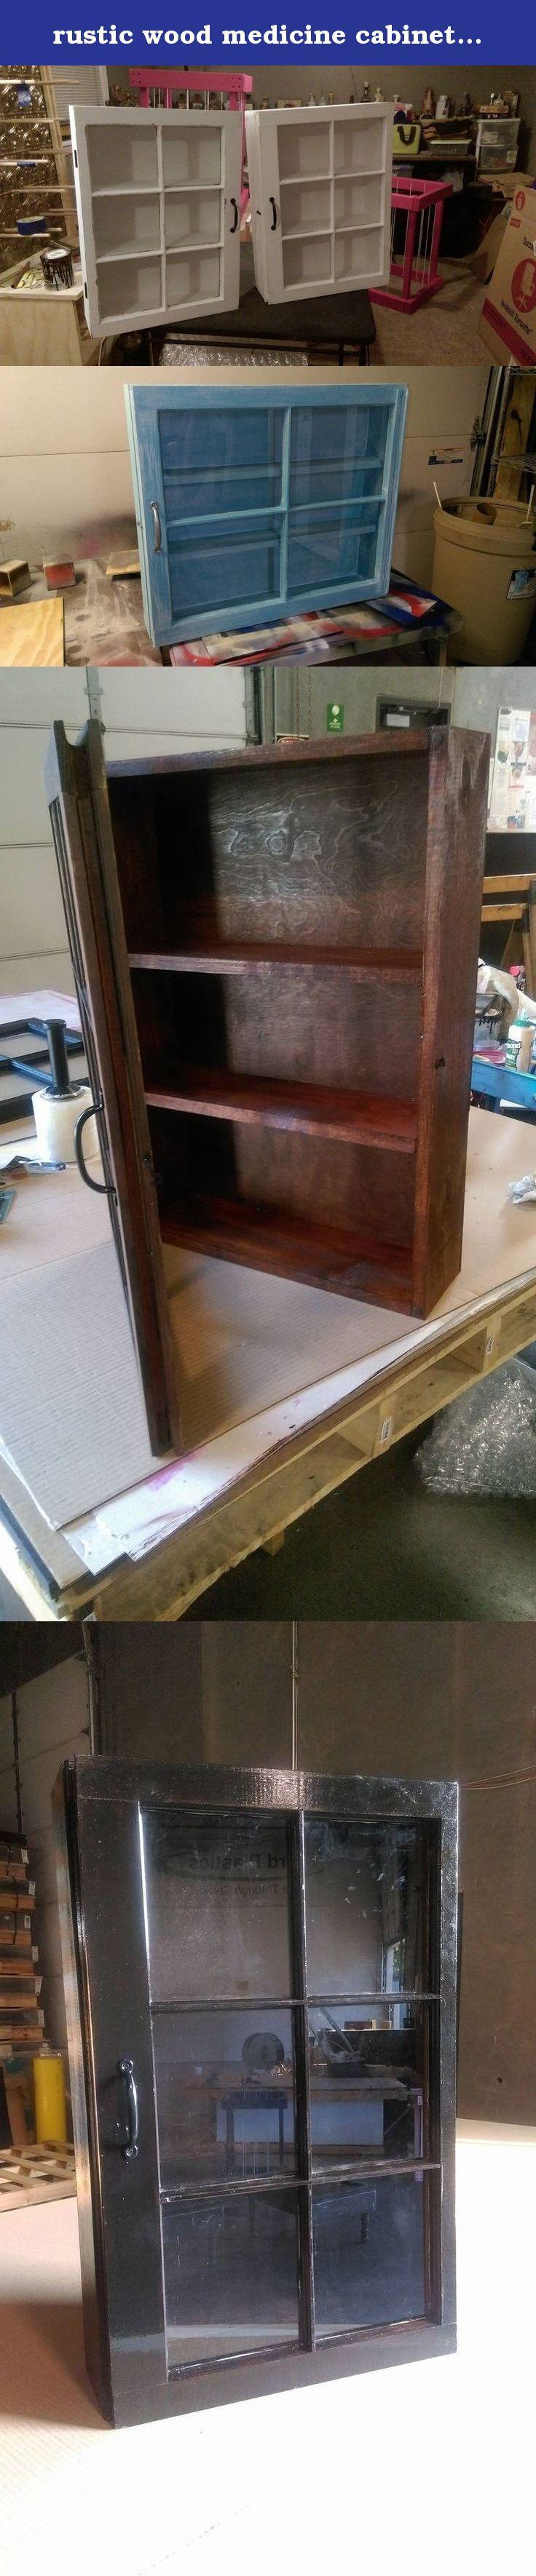 Rustic Wood Medicine Cabinet Over 1000 Idcer Om Rustic Medicine Cabinets P Pinterest